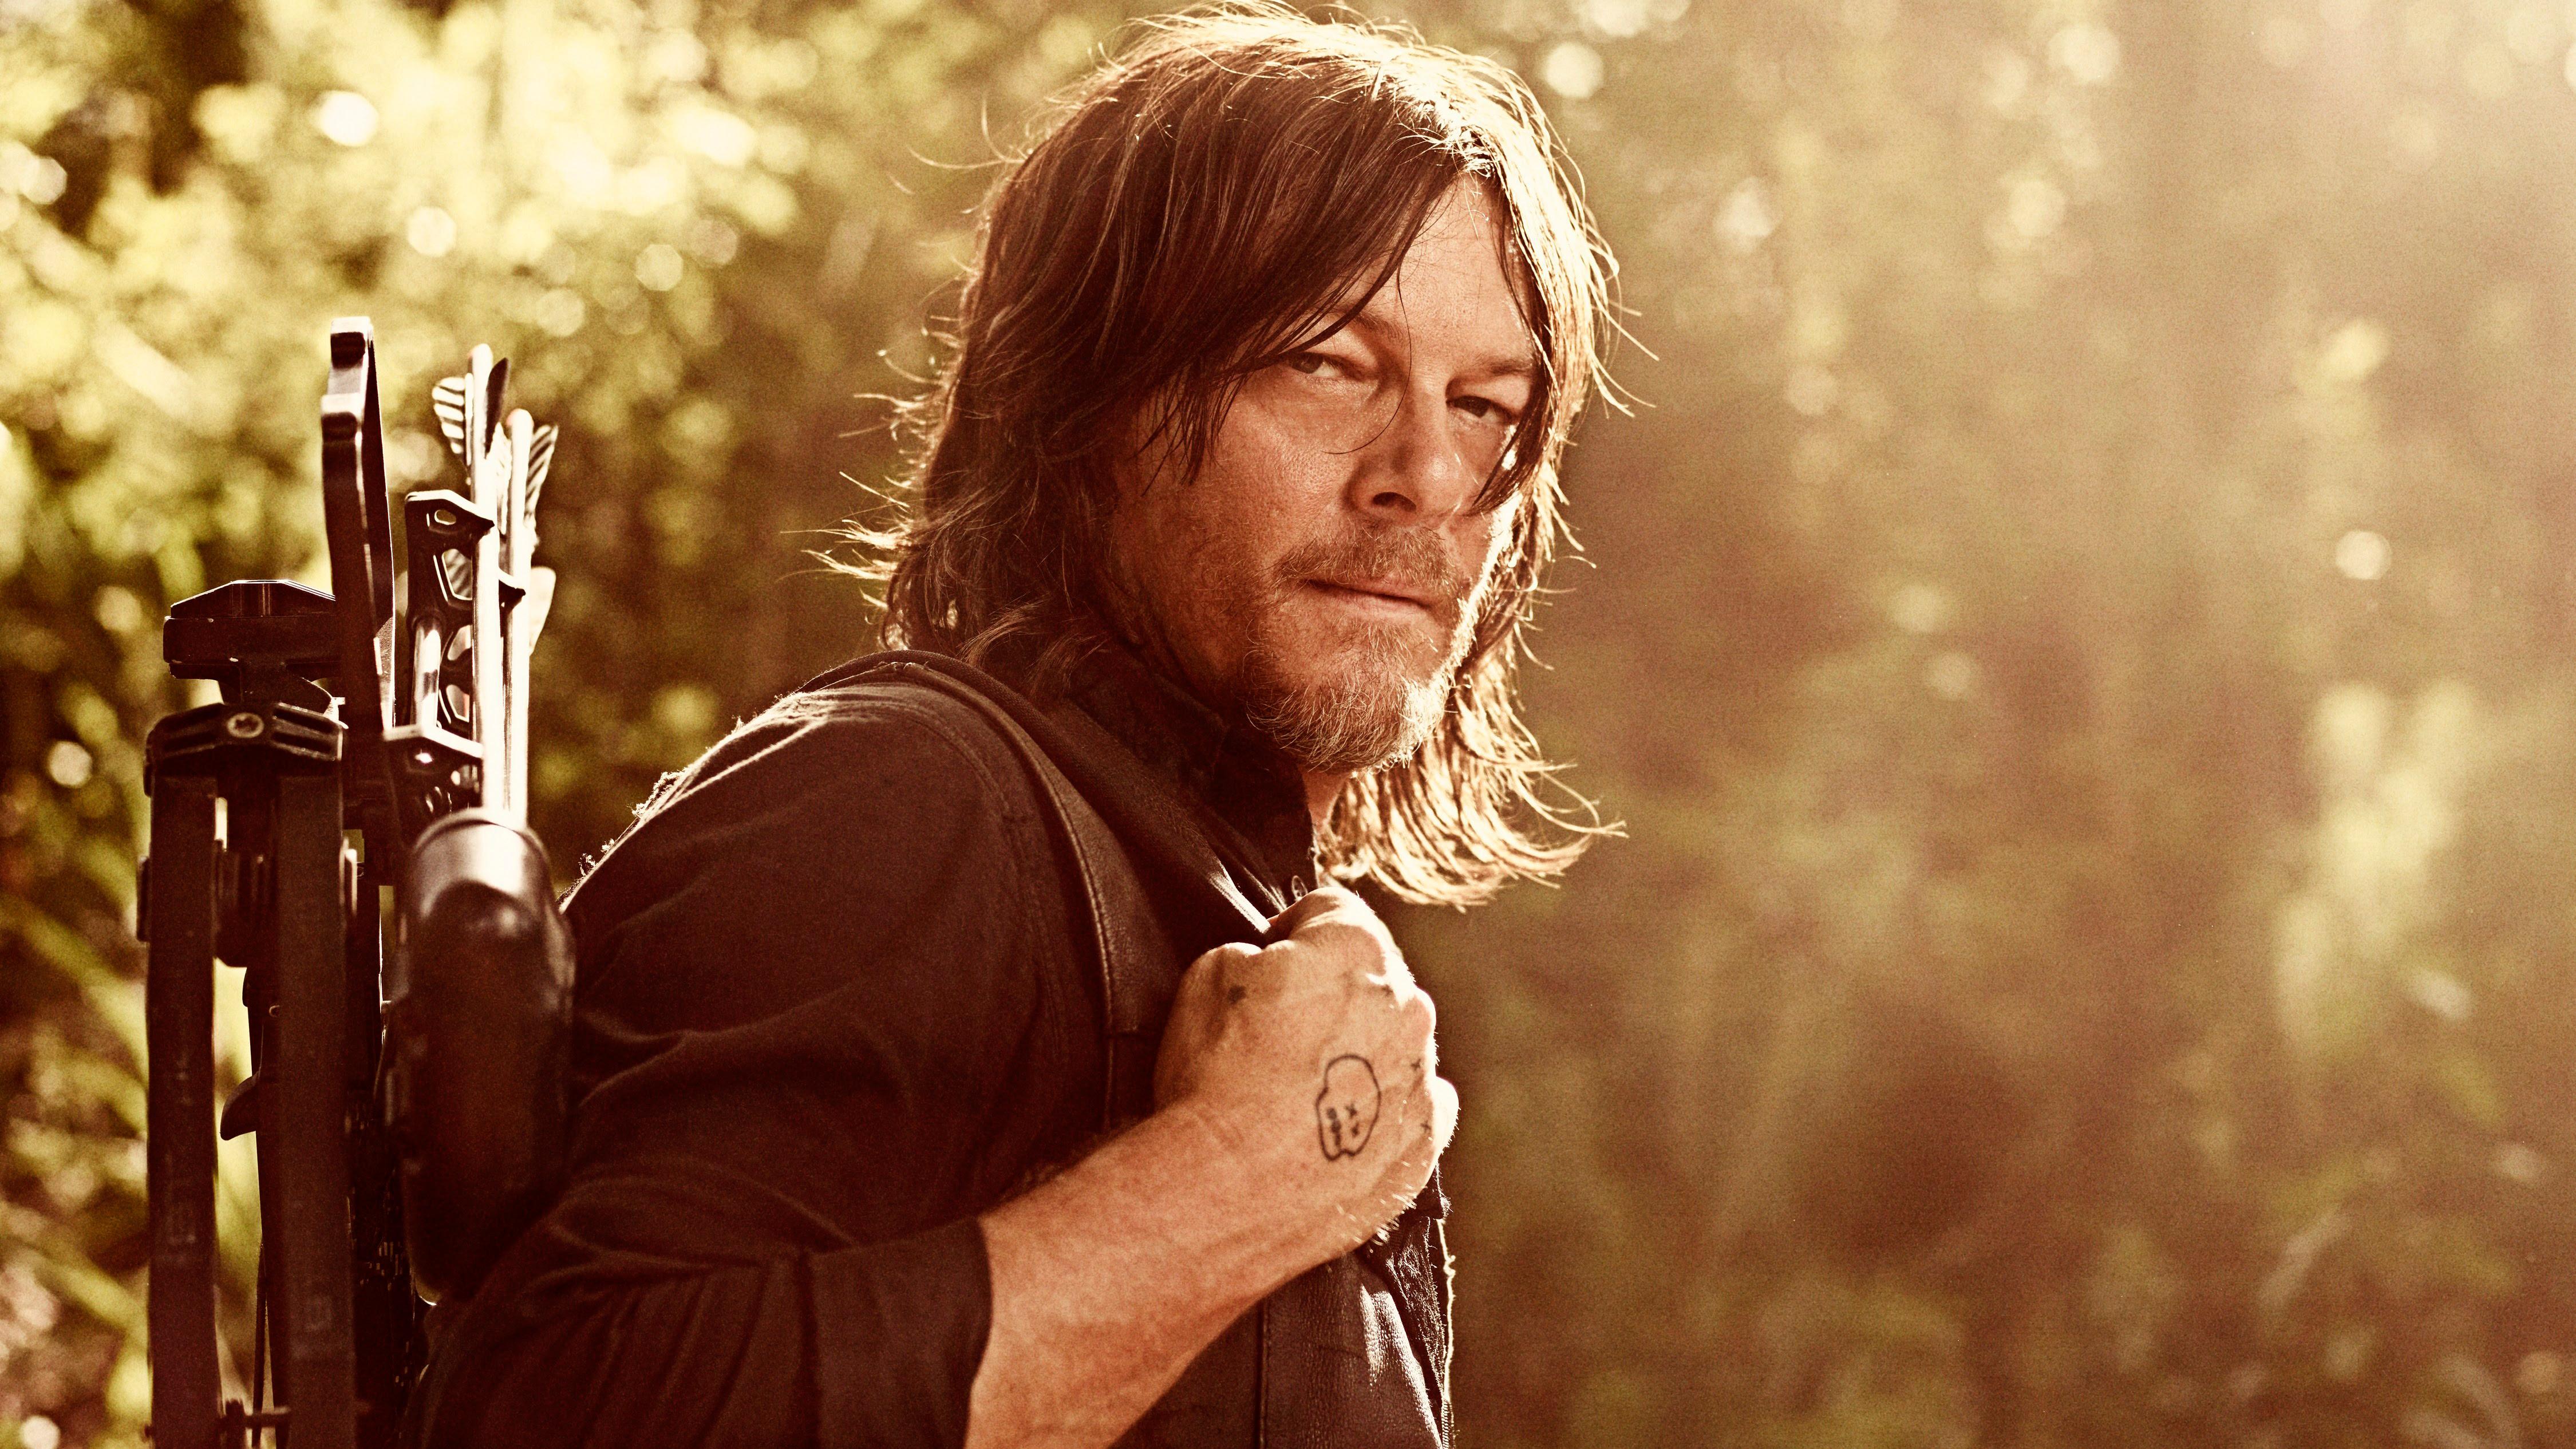 Daryl Dixon In The Walking Dead Season 9 Wallpapers Hd Wallpapers